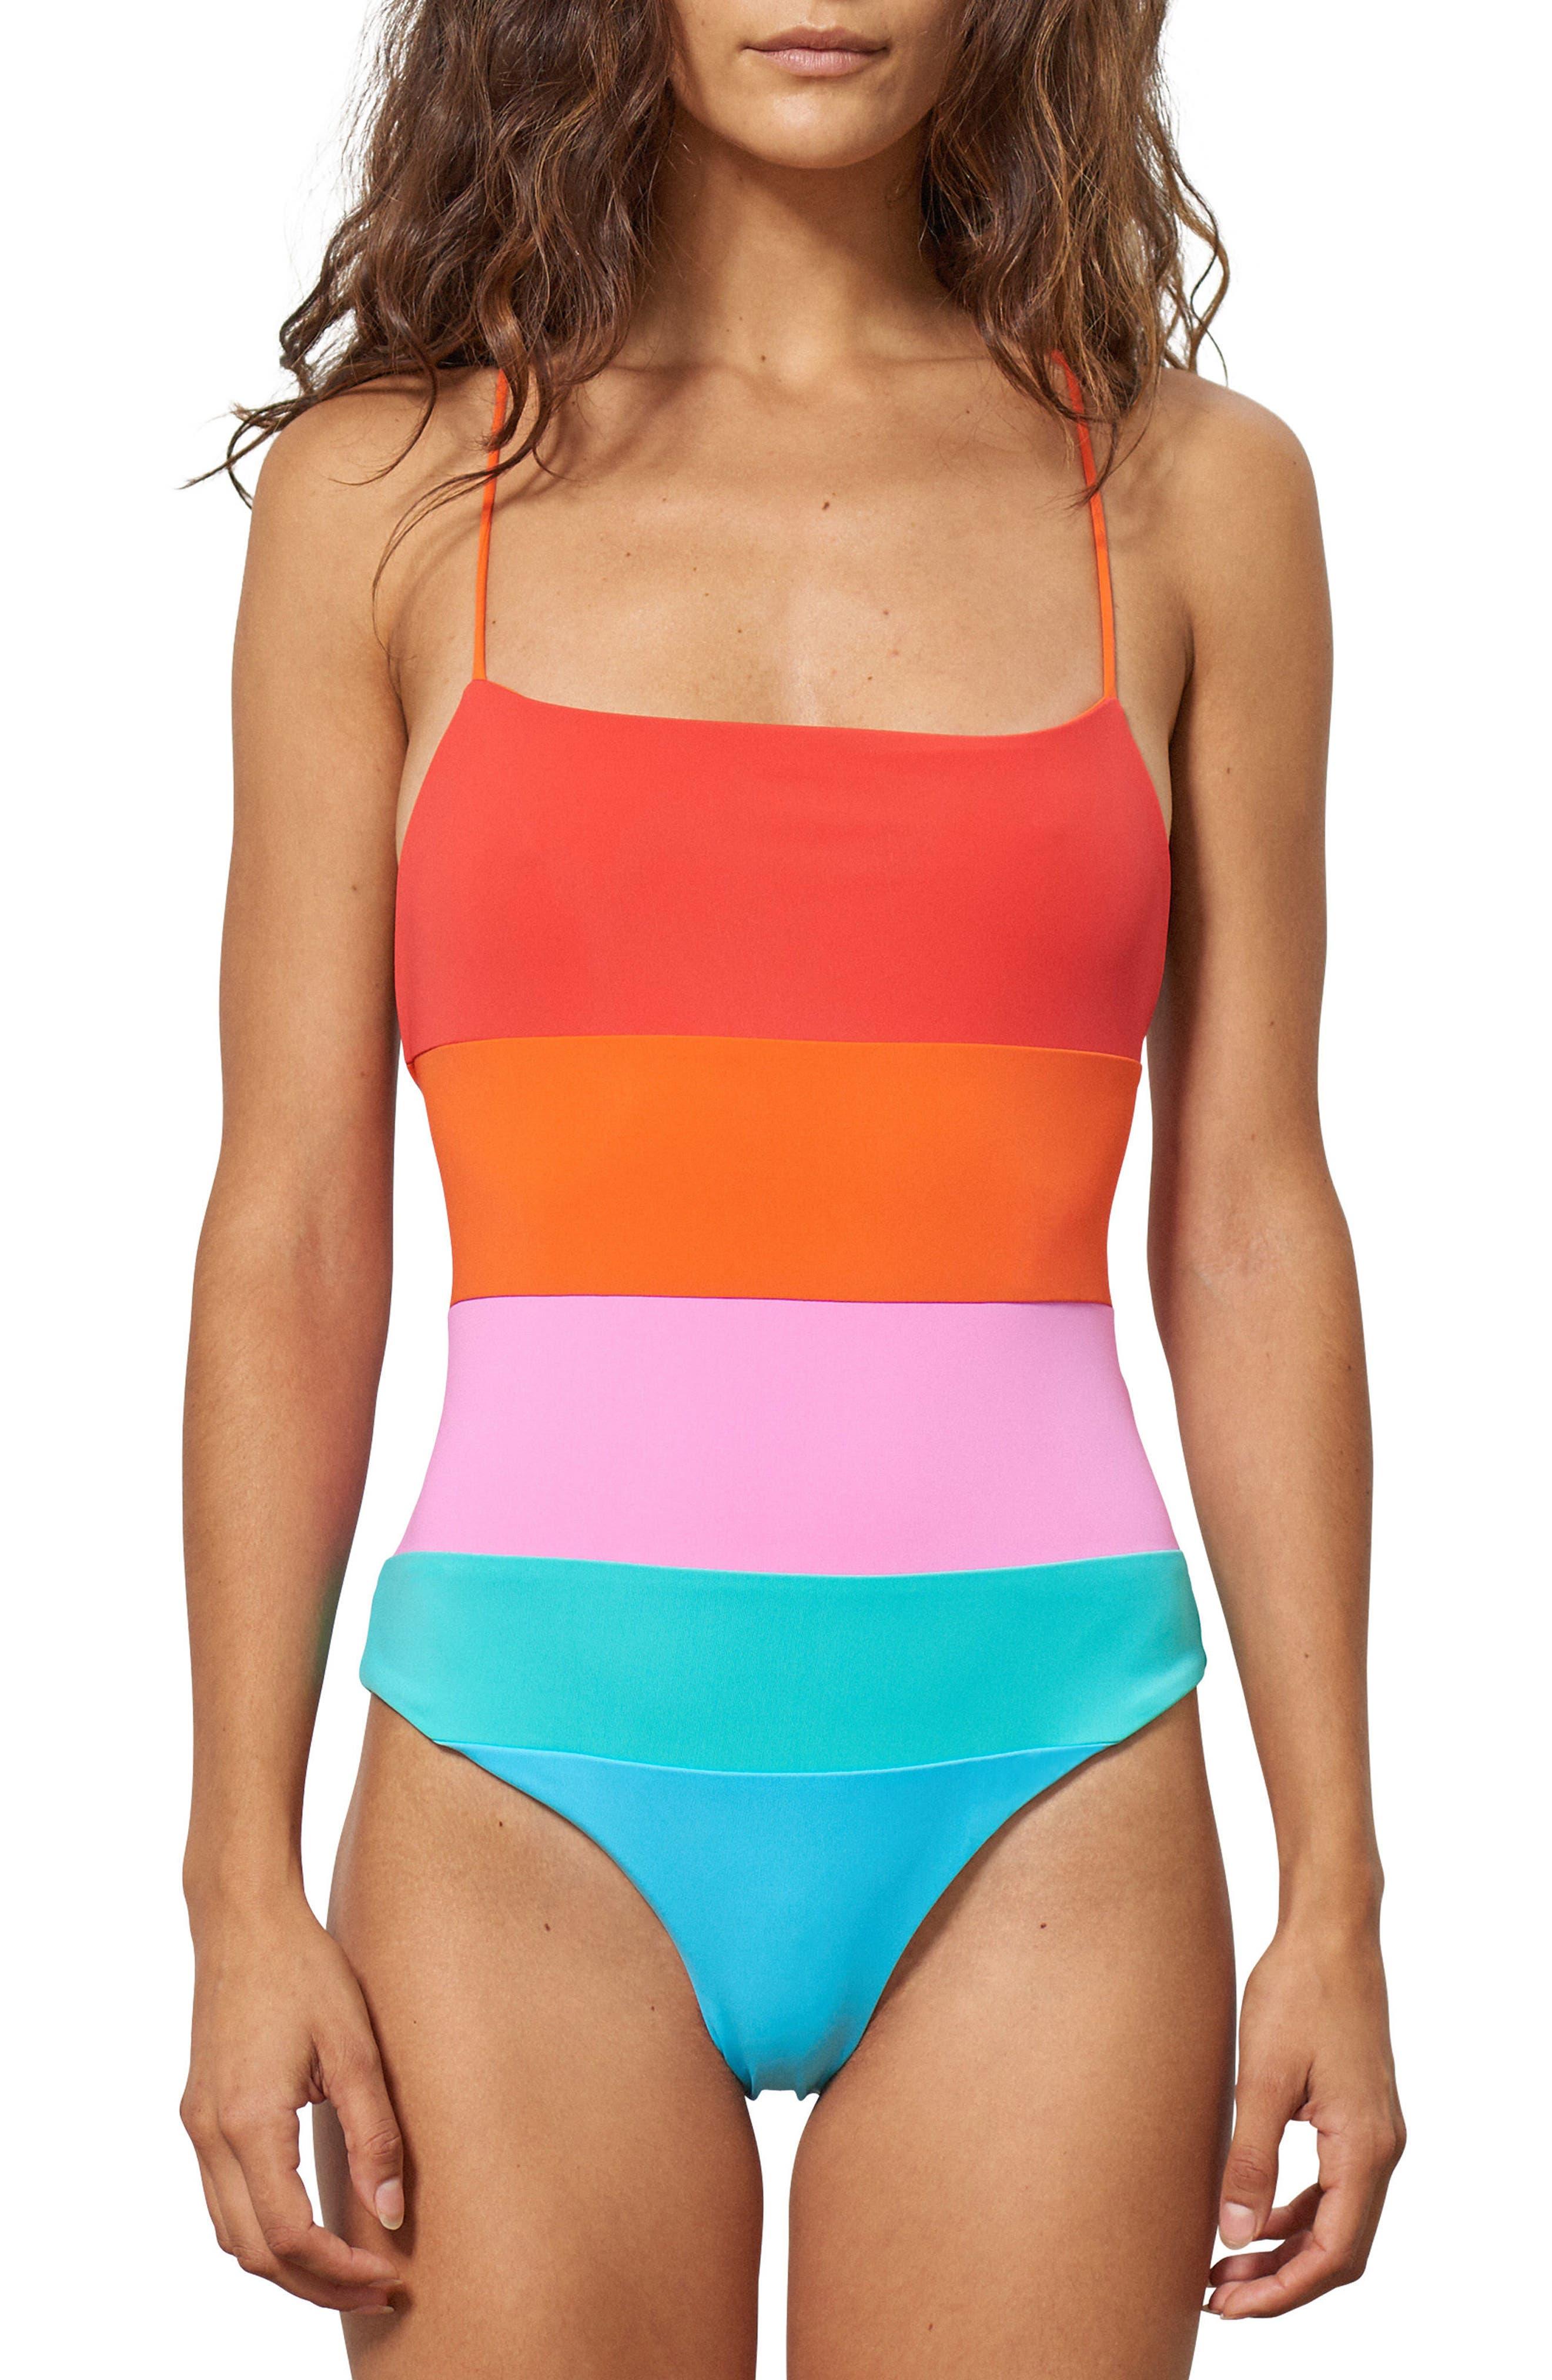 Olympia One-Piece Swimsuit,                             Main thumbnail 1, color,                             Orange Multi